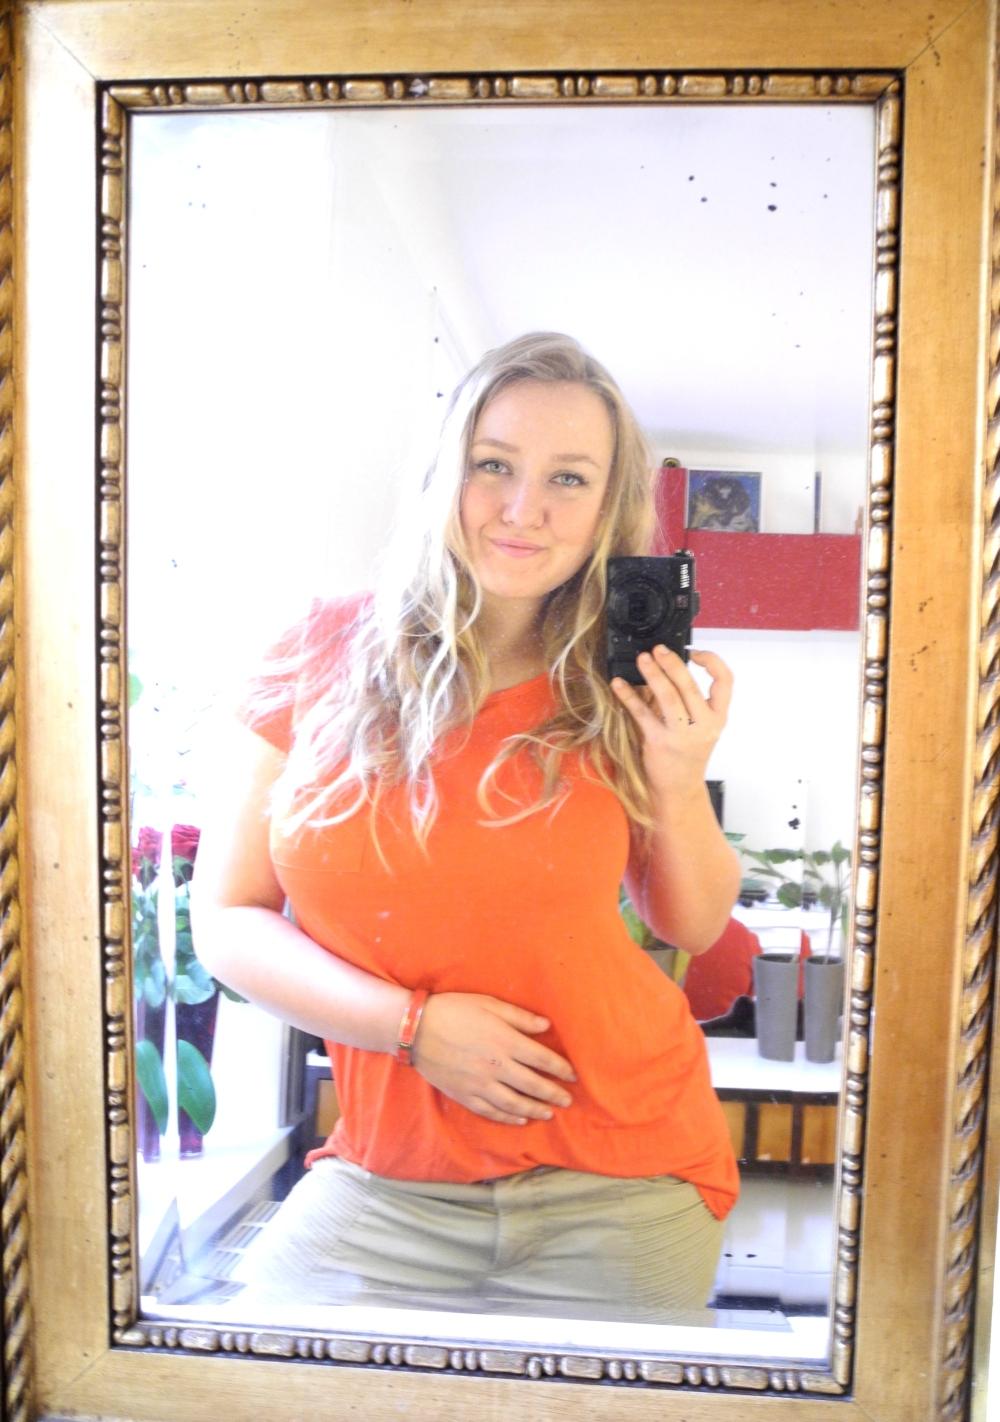 En Dagens Outfot bild på mig, orange tröja och matchande armband.